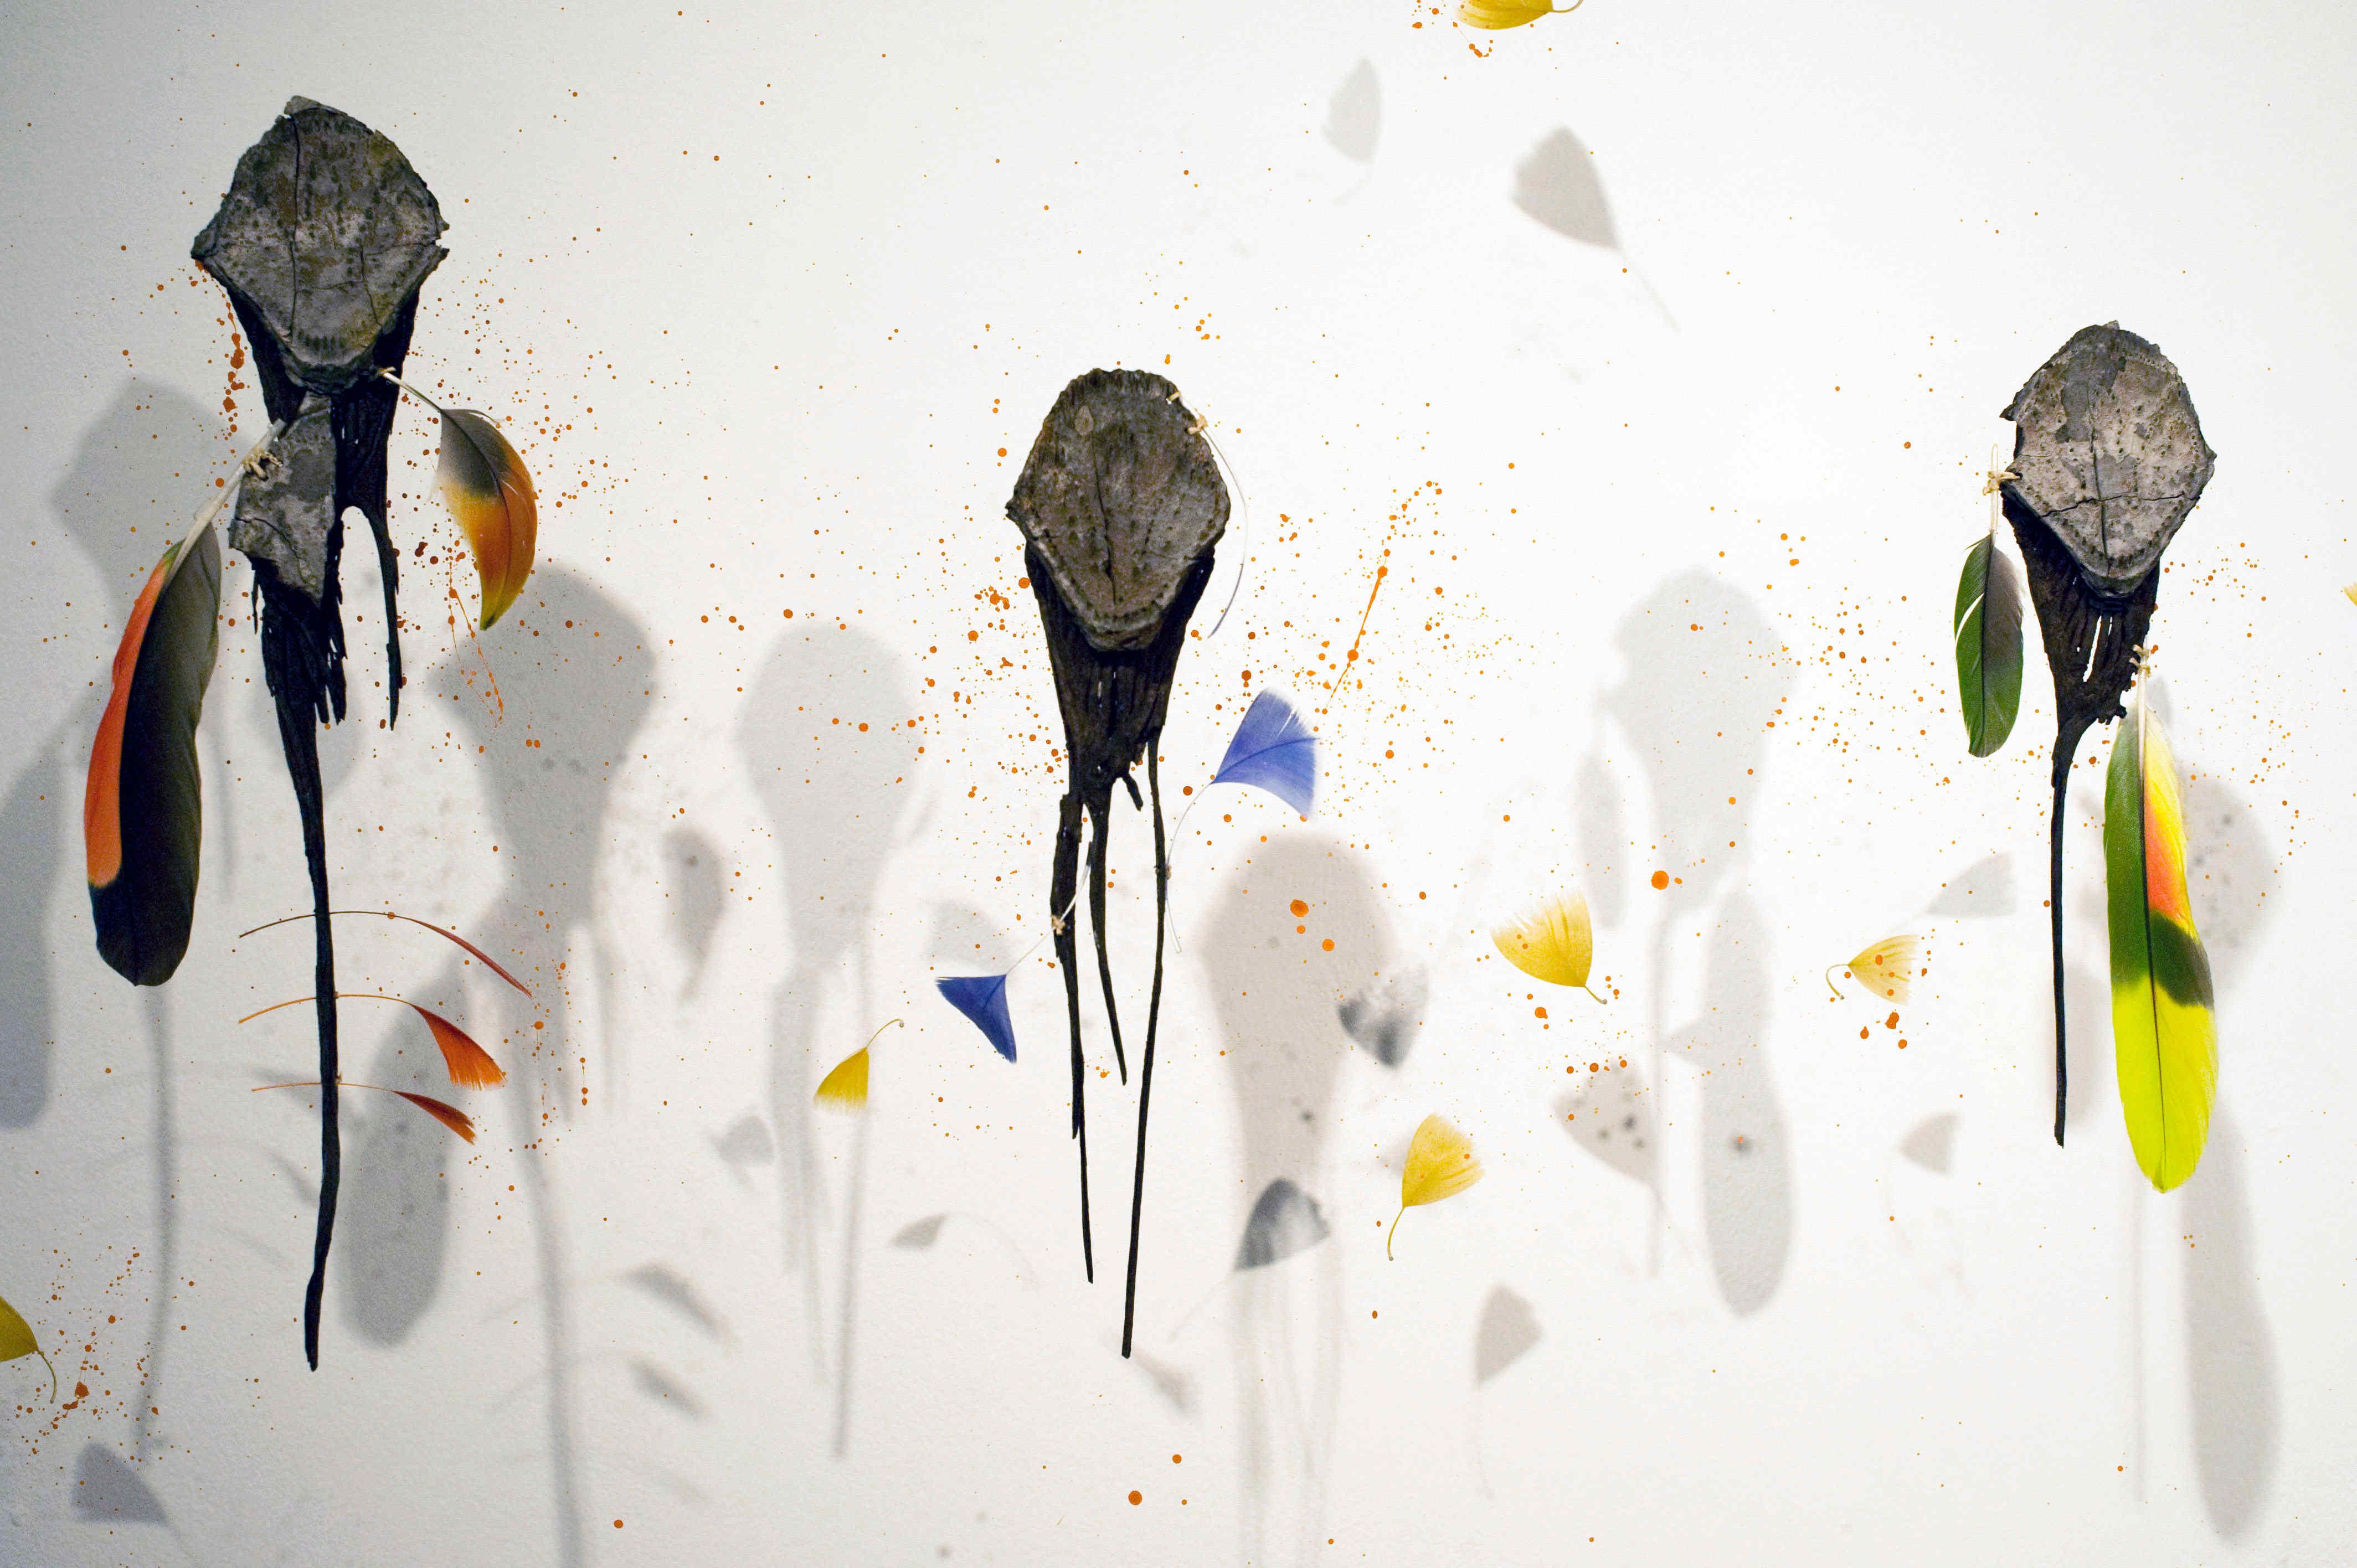 Emmanuel Fillot, courtesy galerie Lélia Mordoch